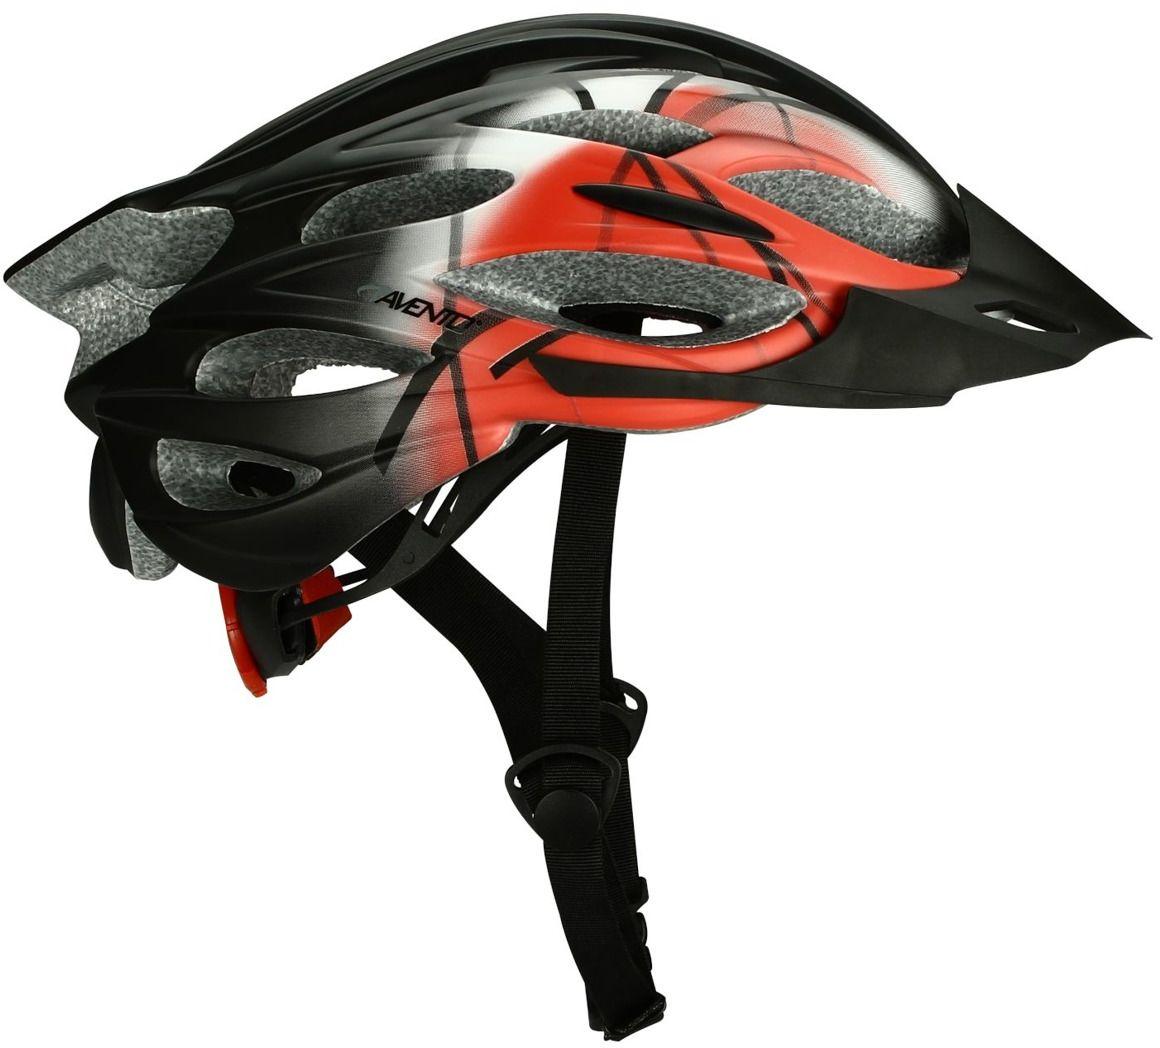 Kask rowerowy szosowy mtb in-mould Avento